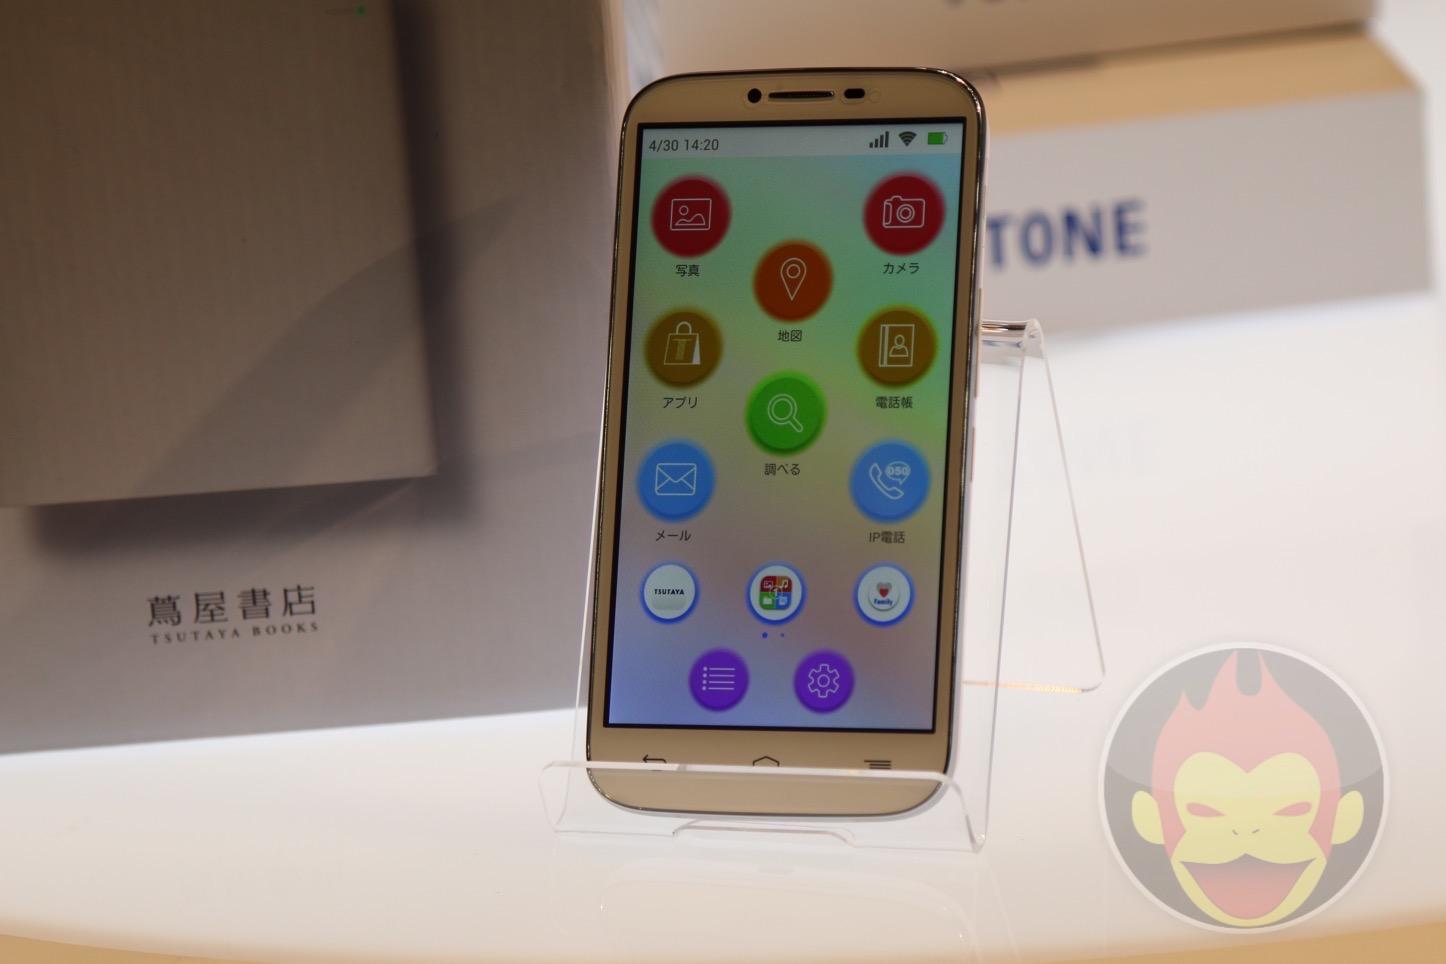 Tone-Mobile-003.JPG